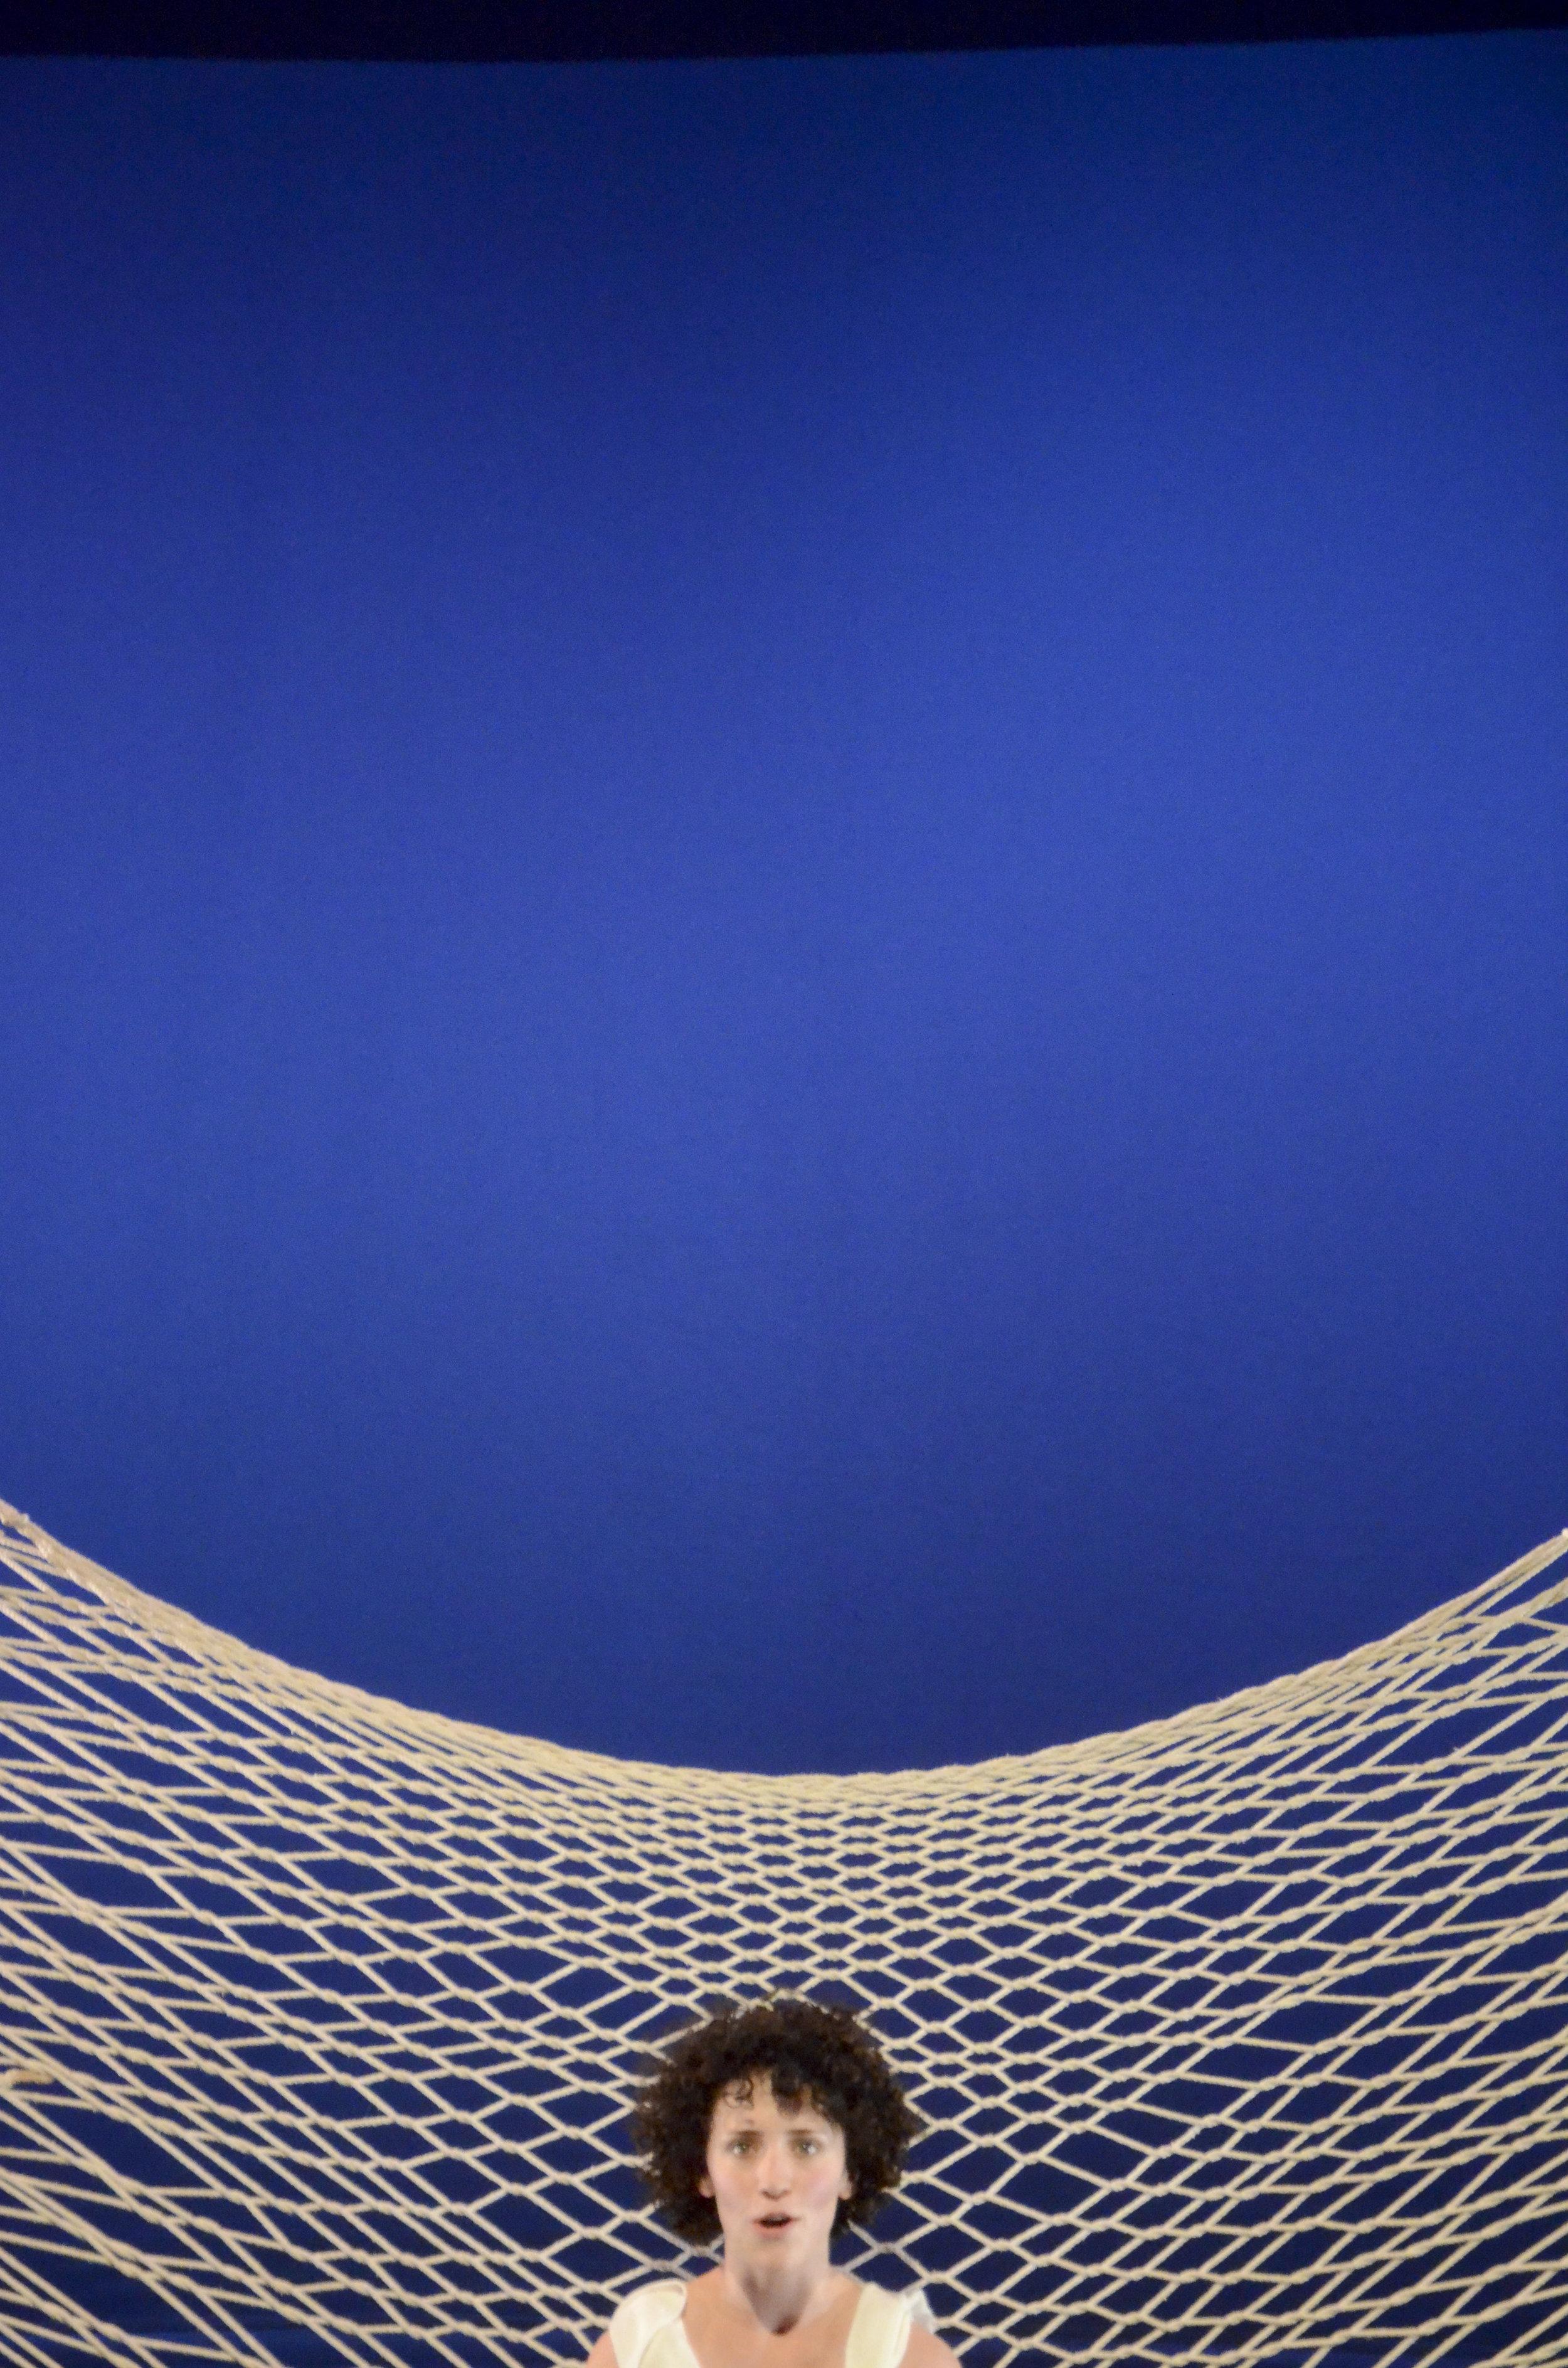 Hammock Photo by Zachary Handler 3.jpg